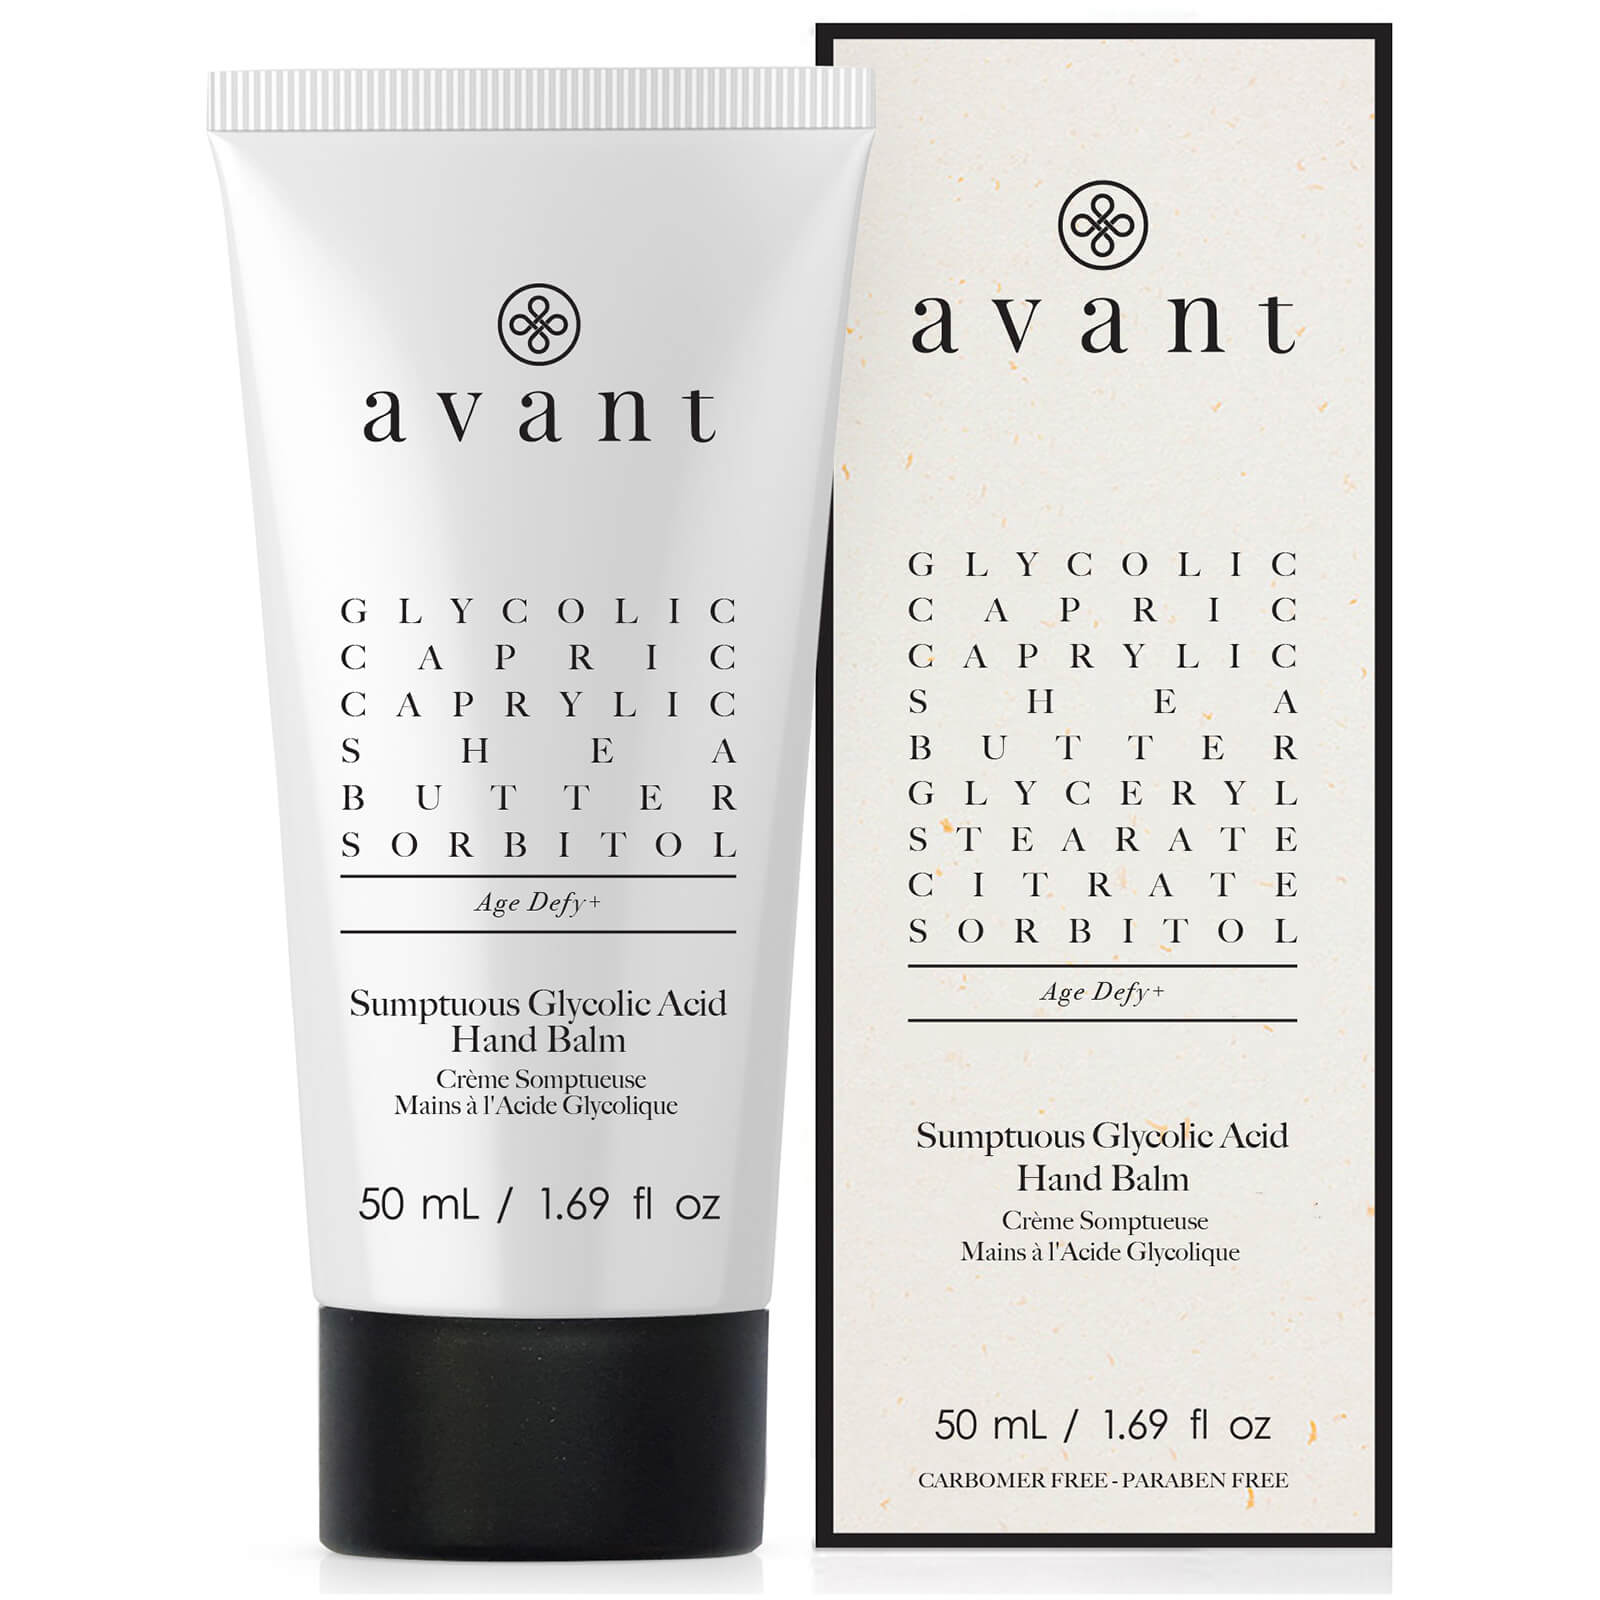 Avant Skincare - Sumptuous Glycolic Acid Hand Balm